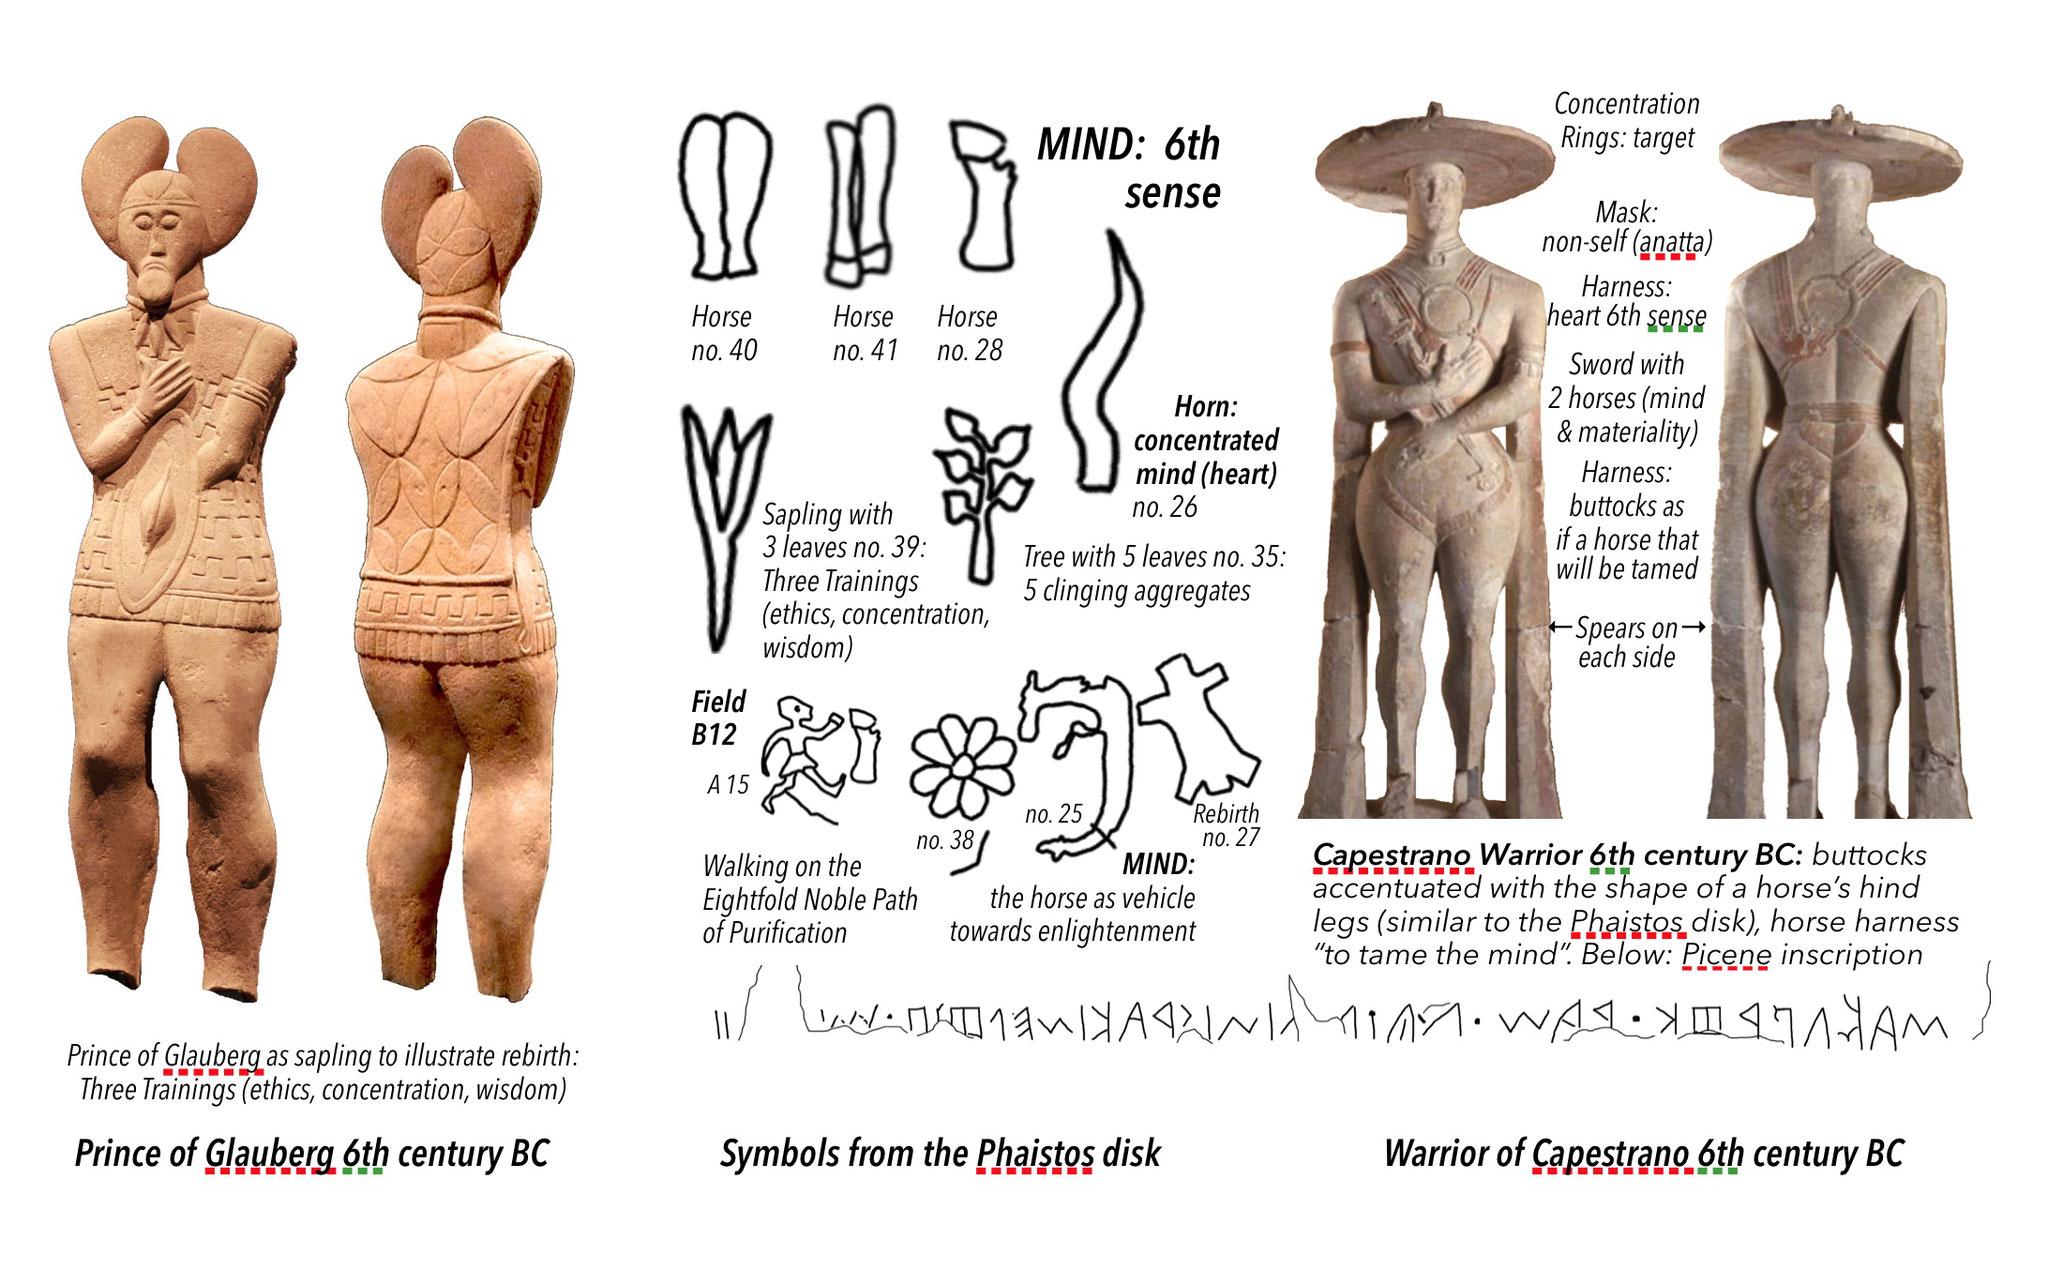 Phaistos symbols integrated into design: Prince of Glauberg, Warrior of Capestrano